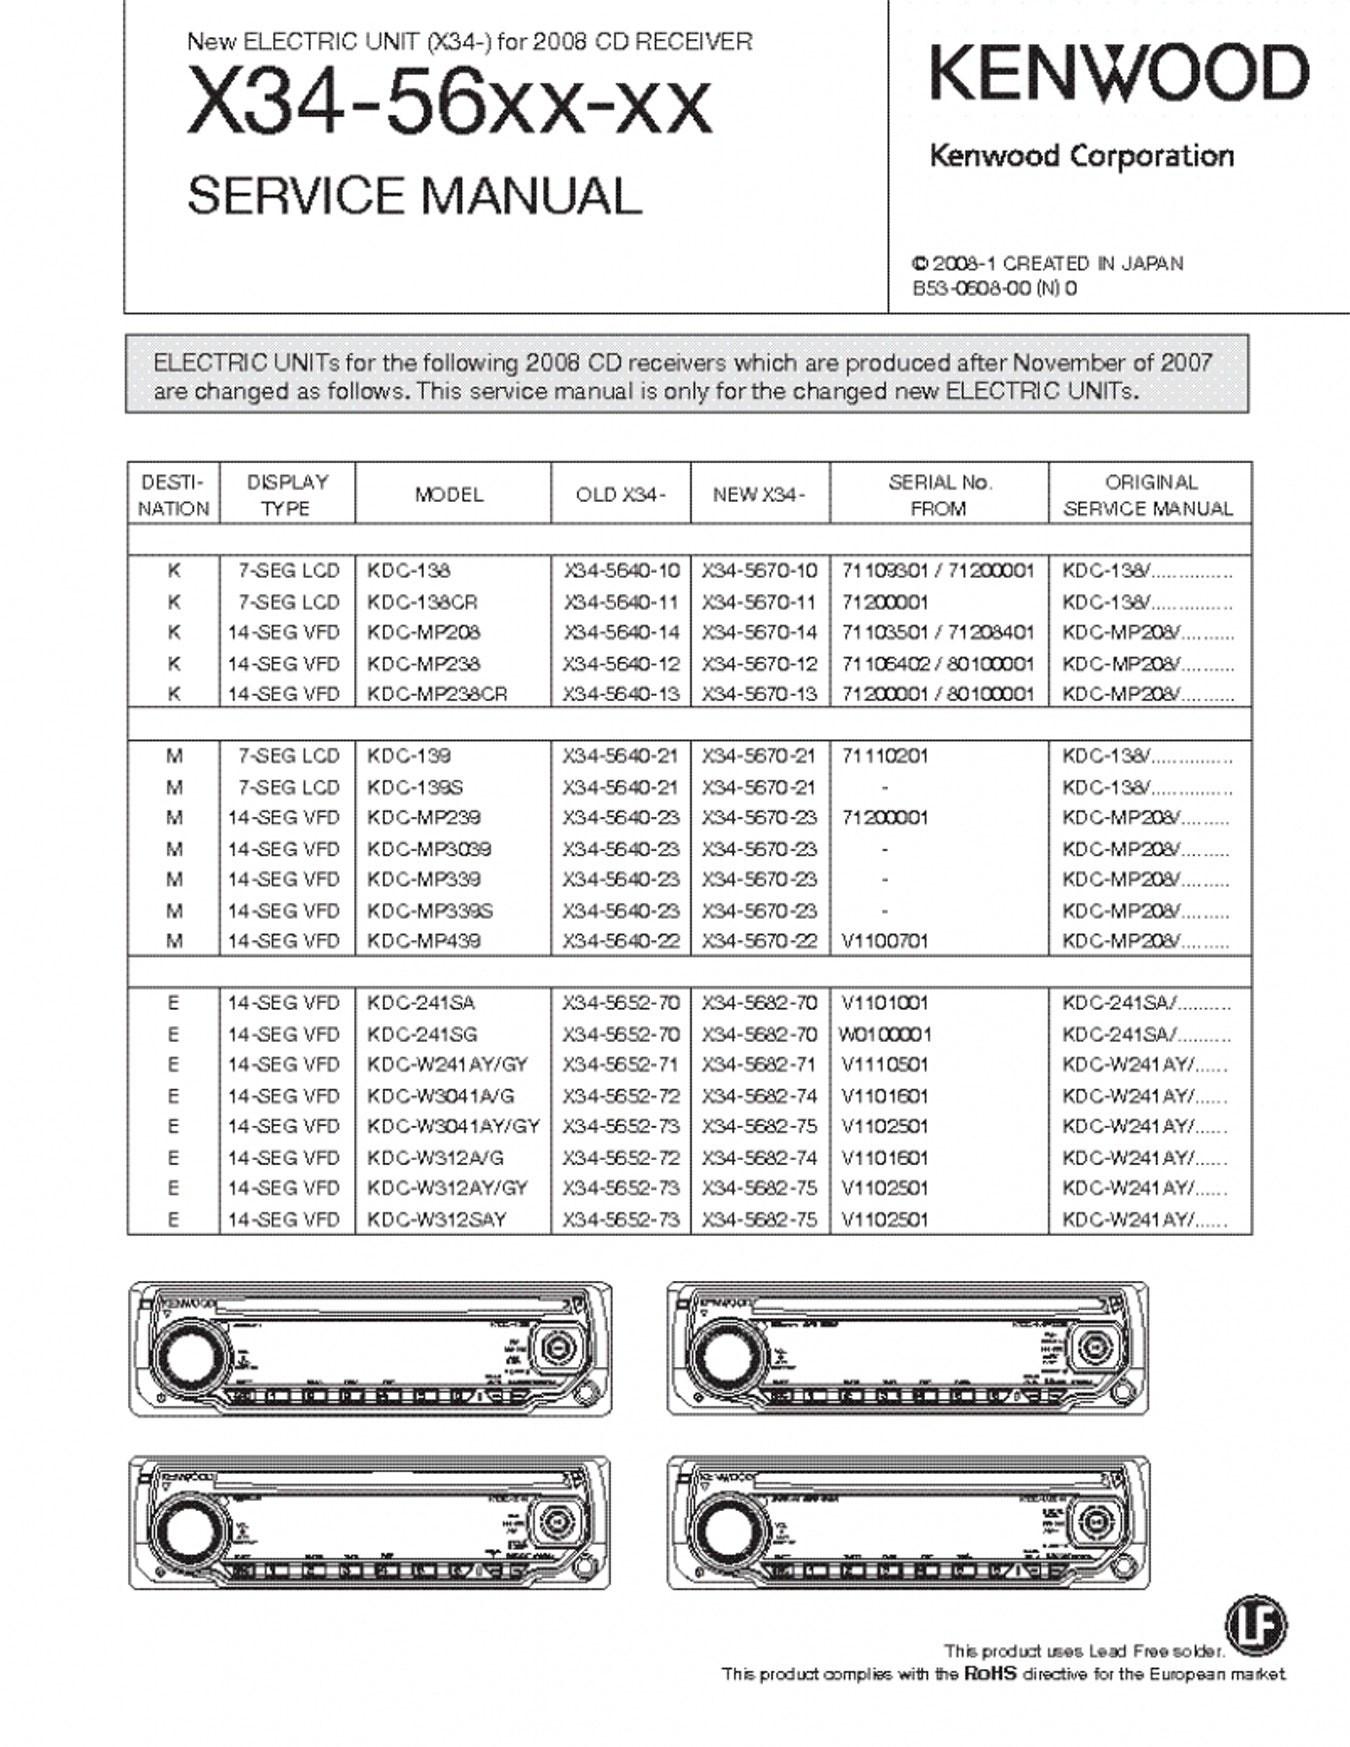 Kenwood Kdc Mp205 Wiring Harness | Manual E-Books - Kenwood Wiring Harness Diagram